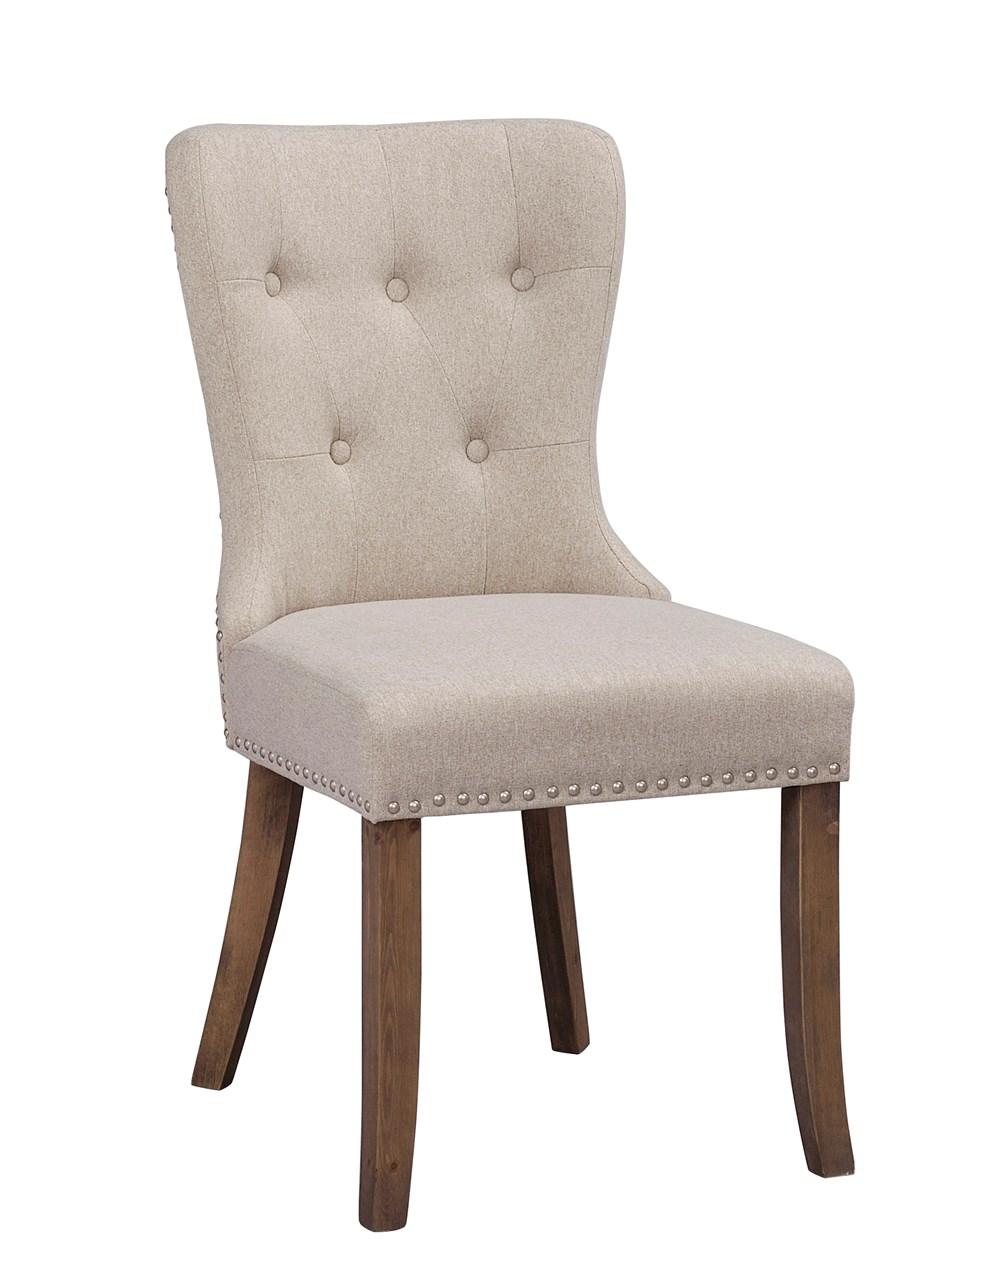 Adele tuoli beige kangas/vintage jalat, Rowico